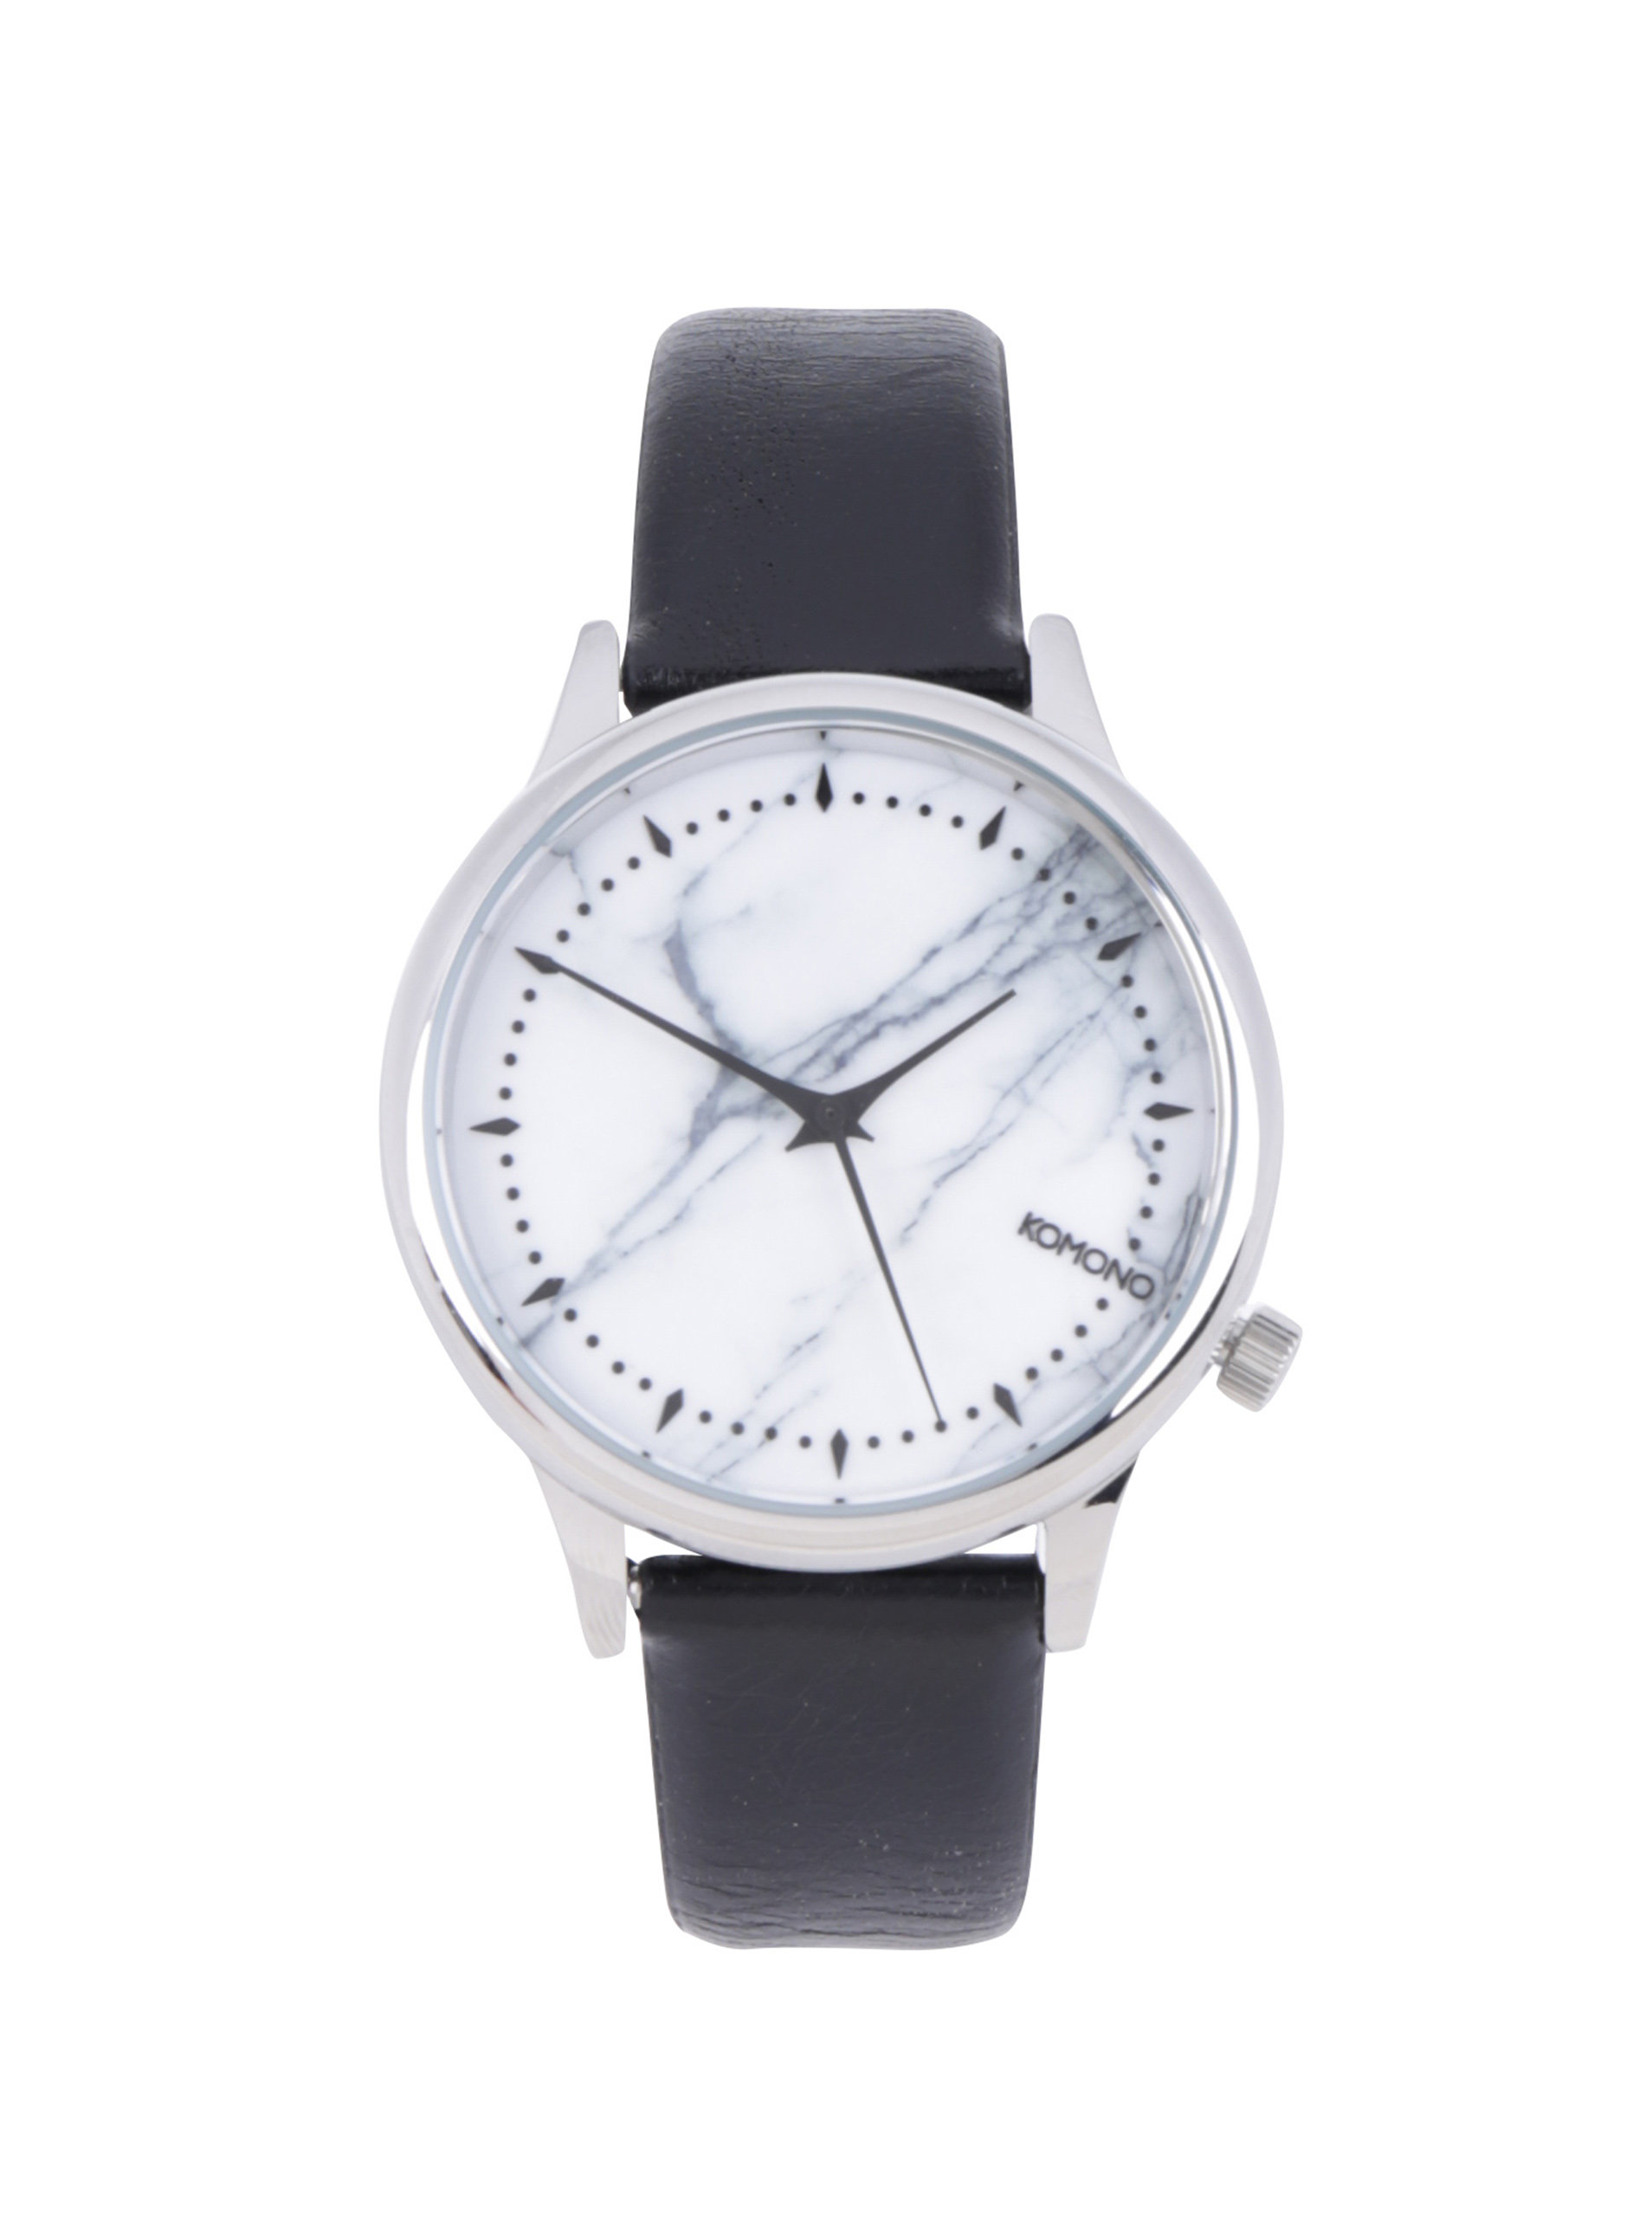 ec269578d8f ... semišové tenisky s detaily Geox Chewa (1 599 Kč). Dámské hodinky s  mramorovaným ciferníkem a černým koženým páskem Komono Estelle Marble